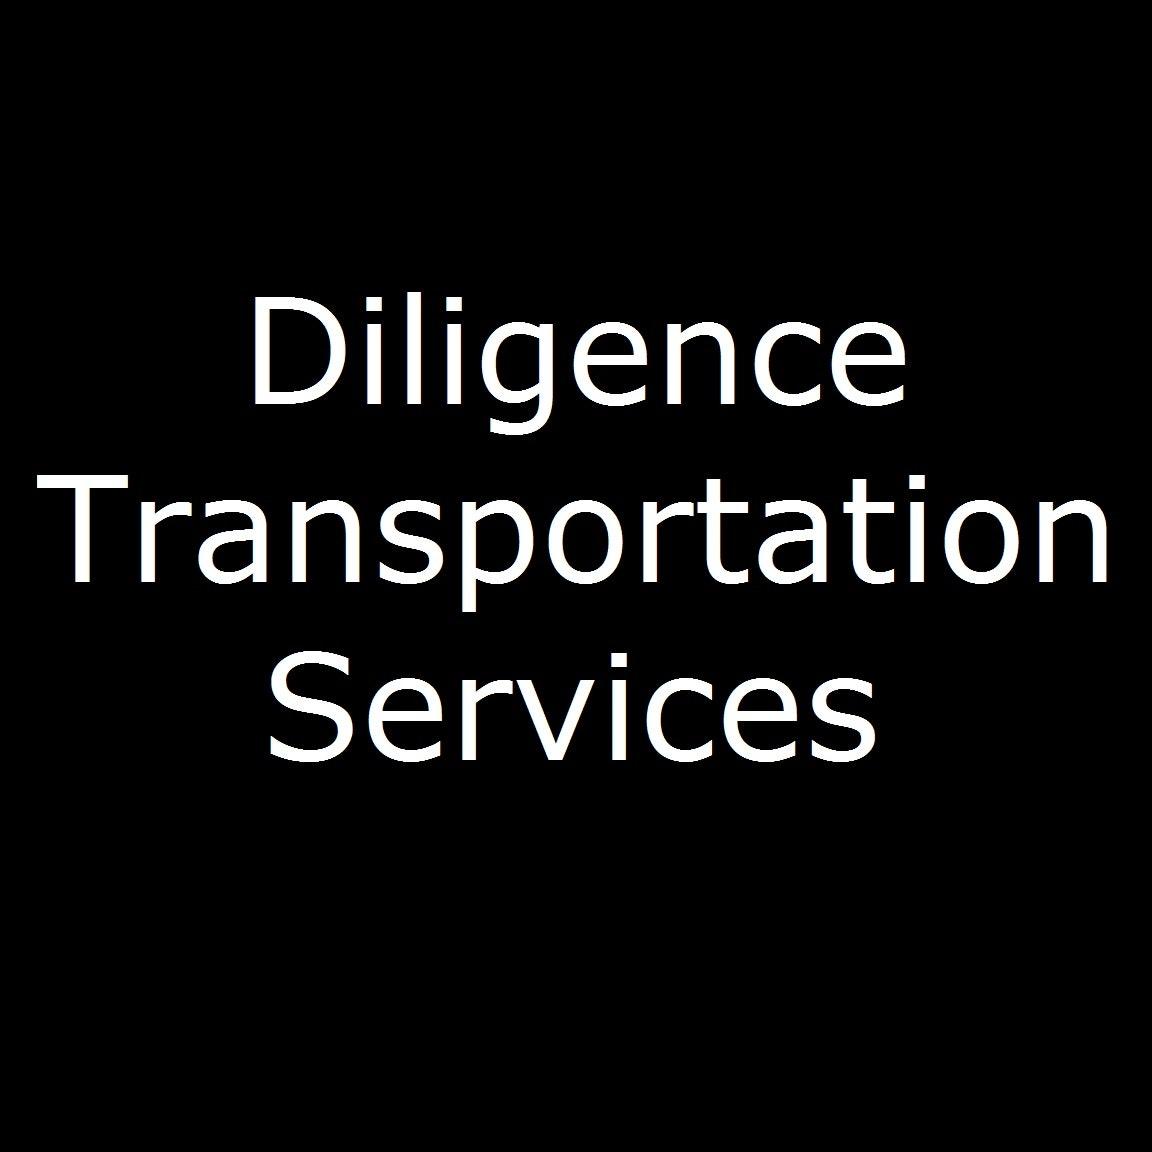 Diligence Transportation Services logo